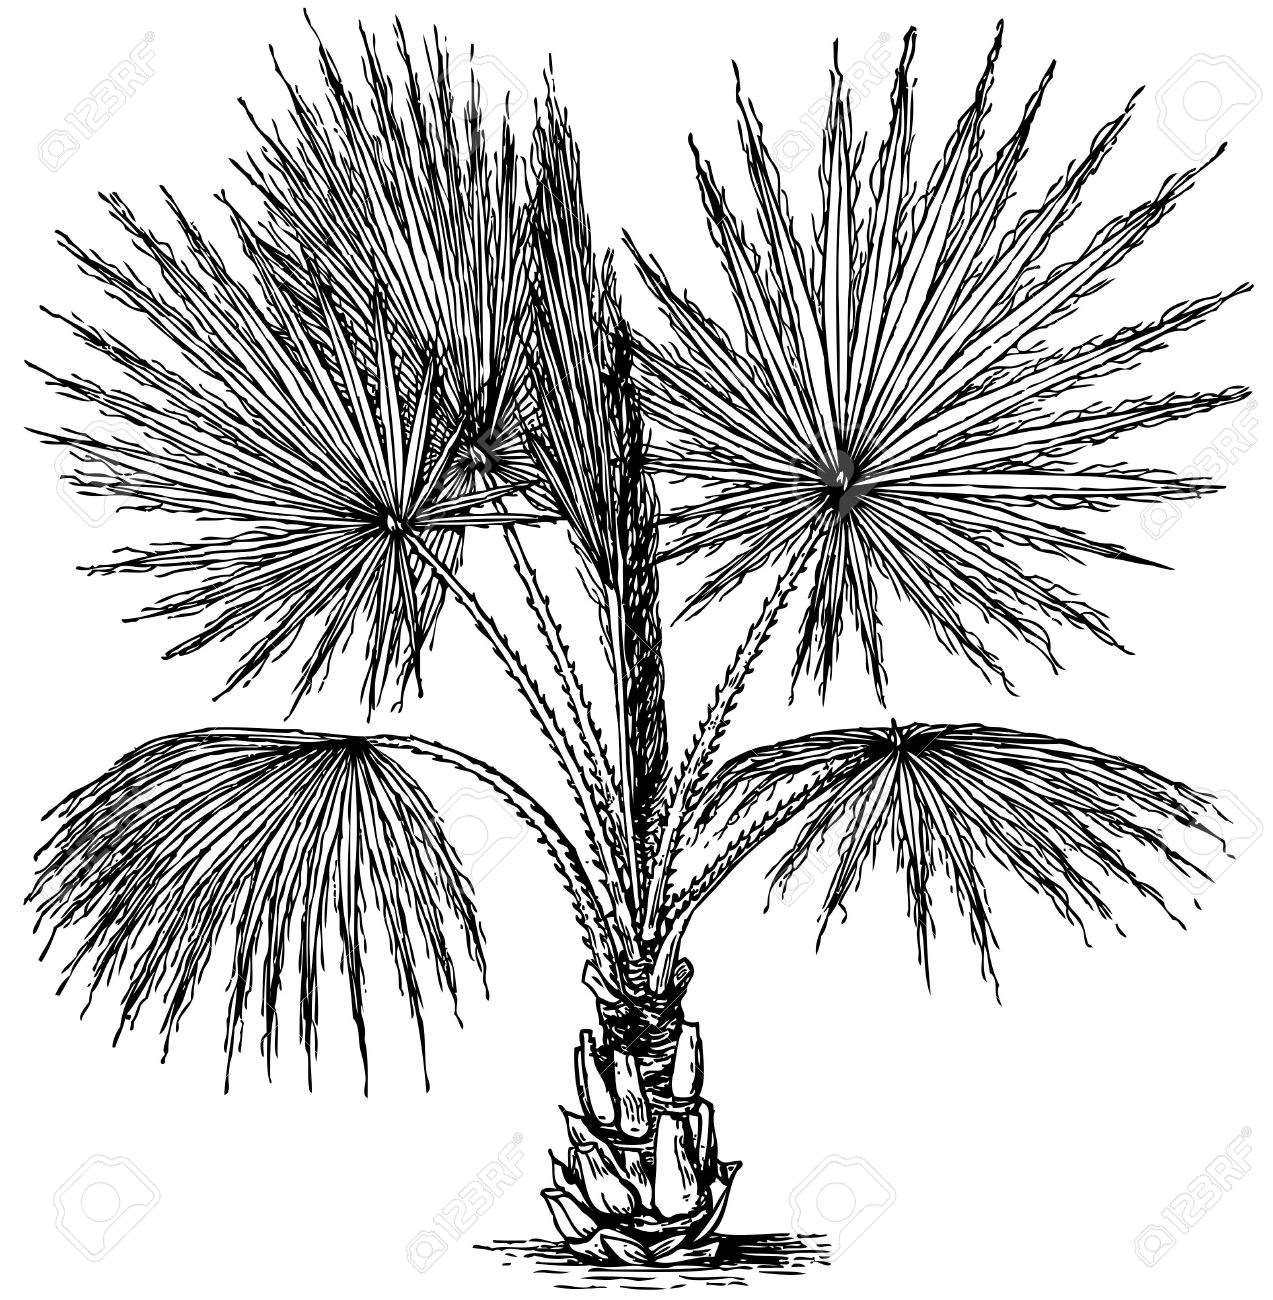 Plant Washingtonia Filifera (California Fan Palm) Isolated On.